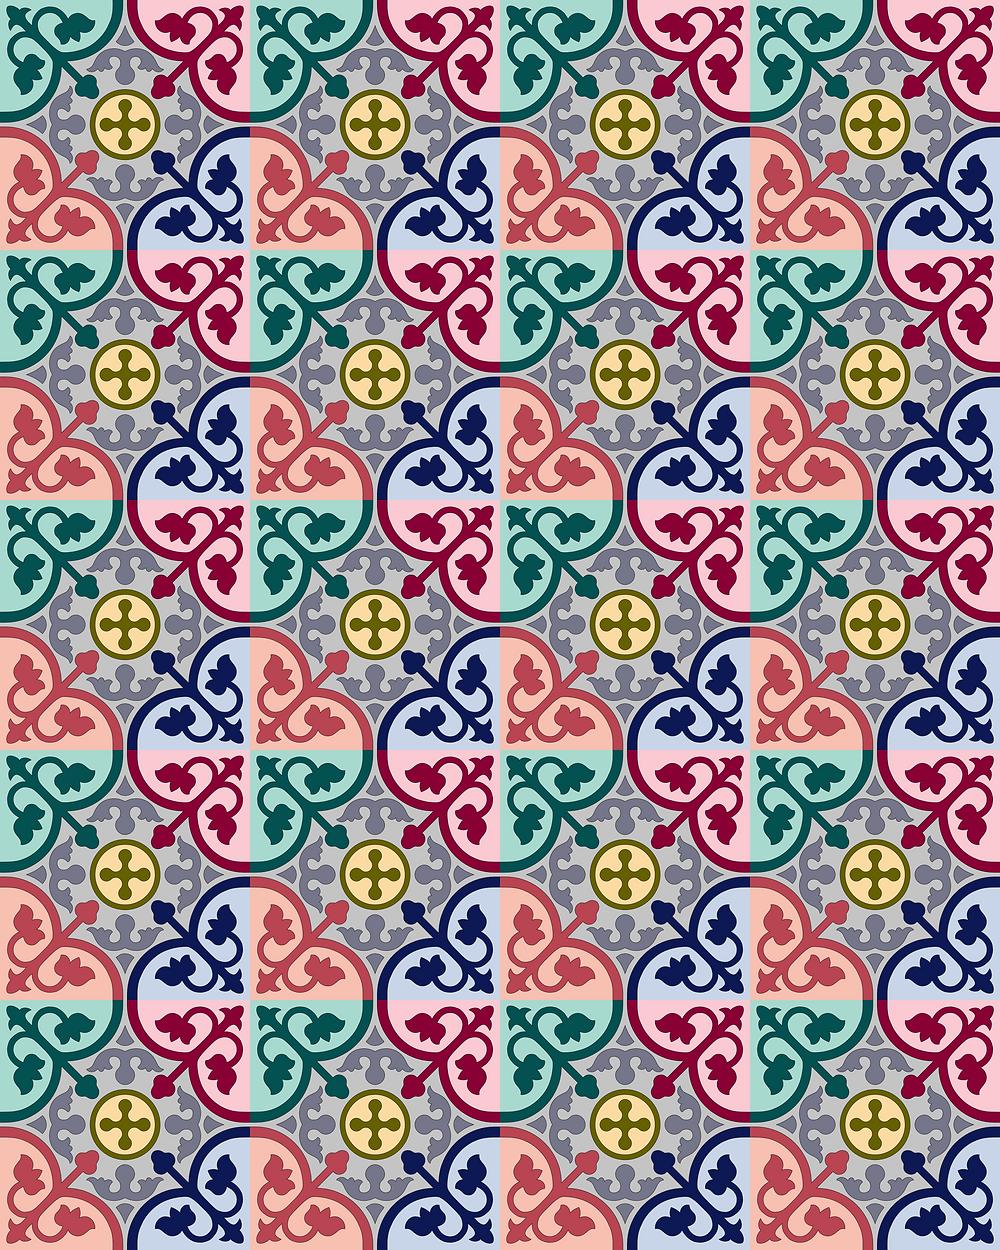 Colourful Peranakan Tiles